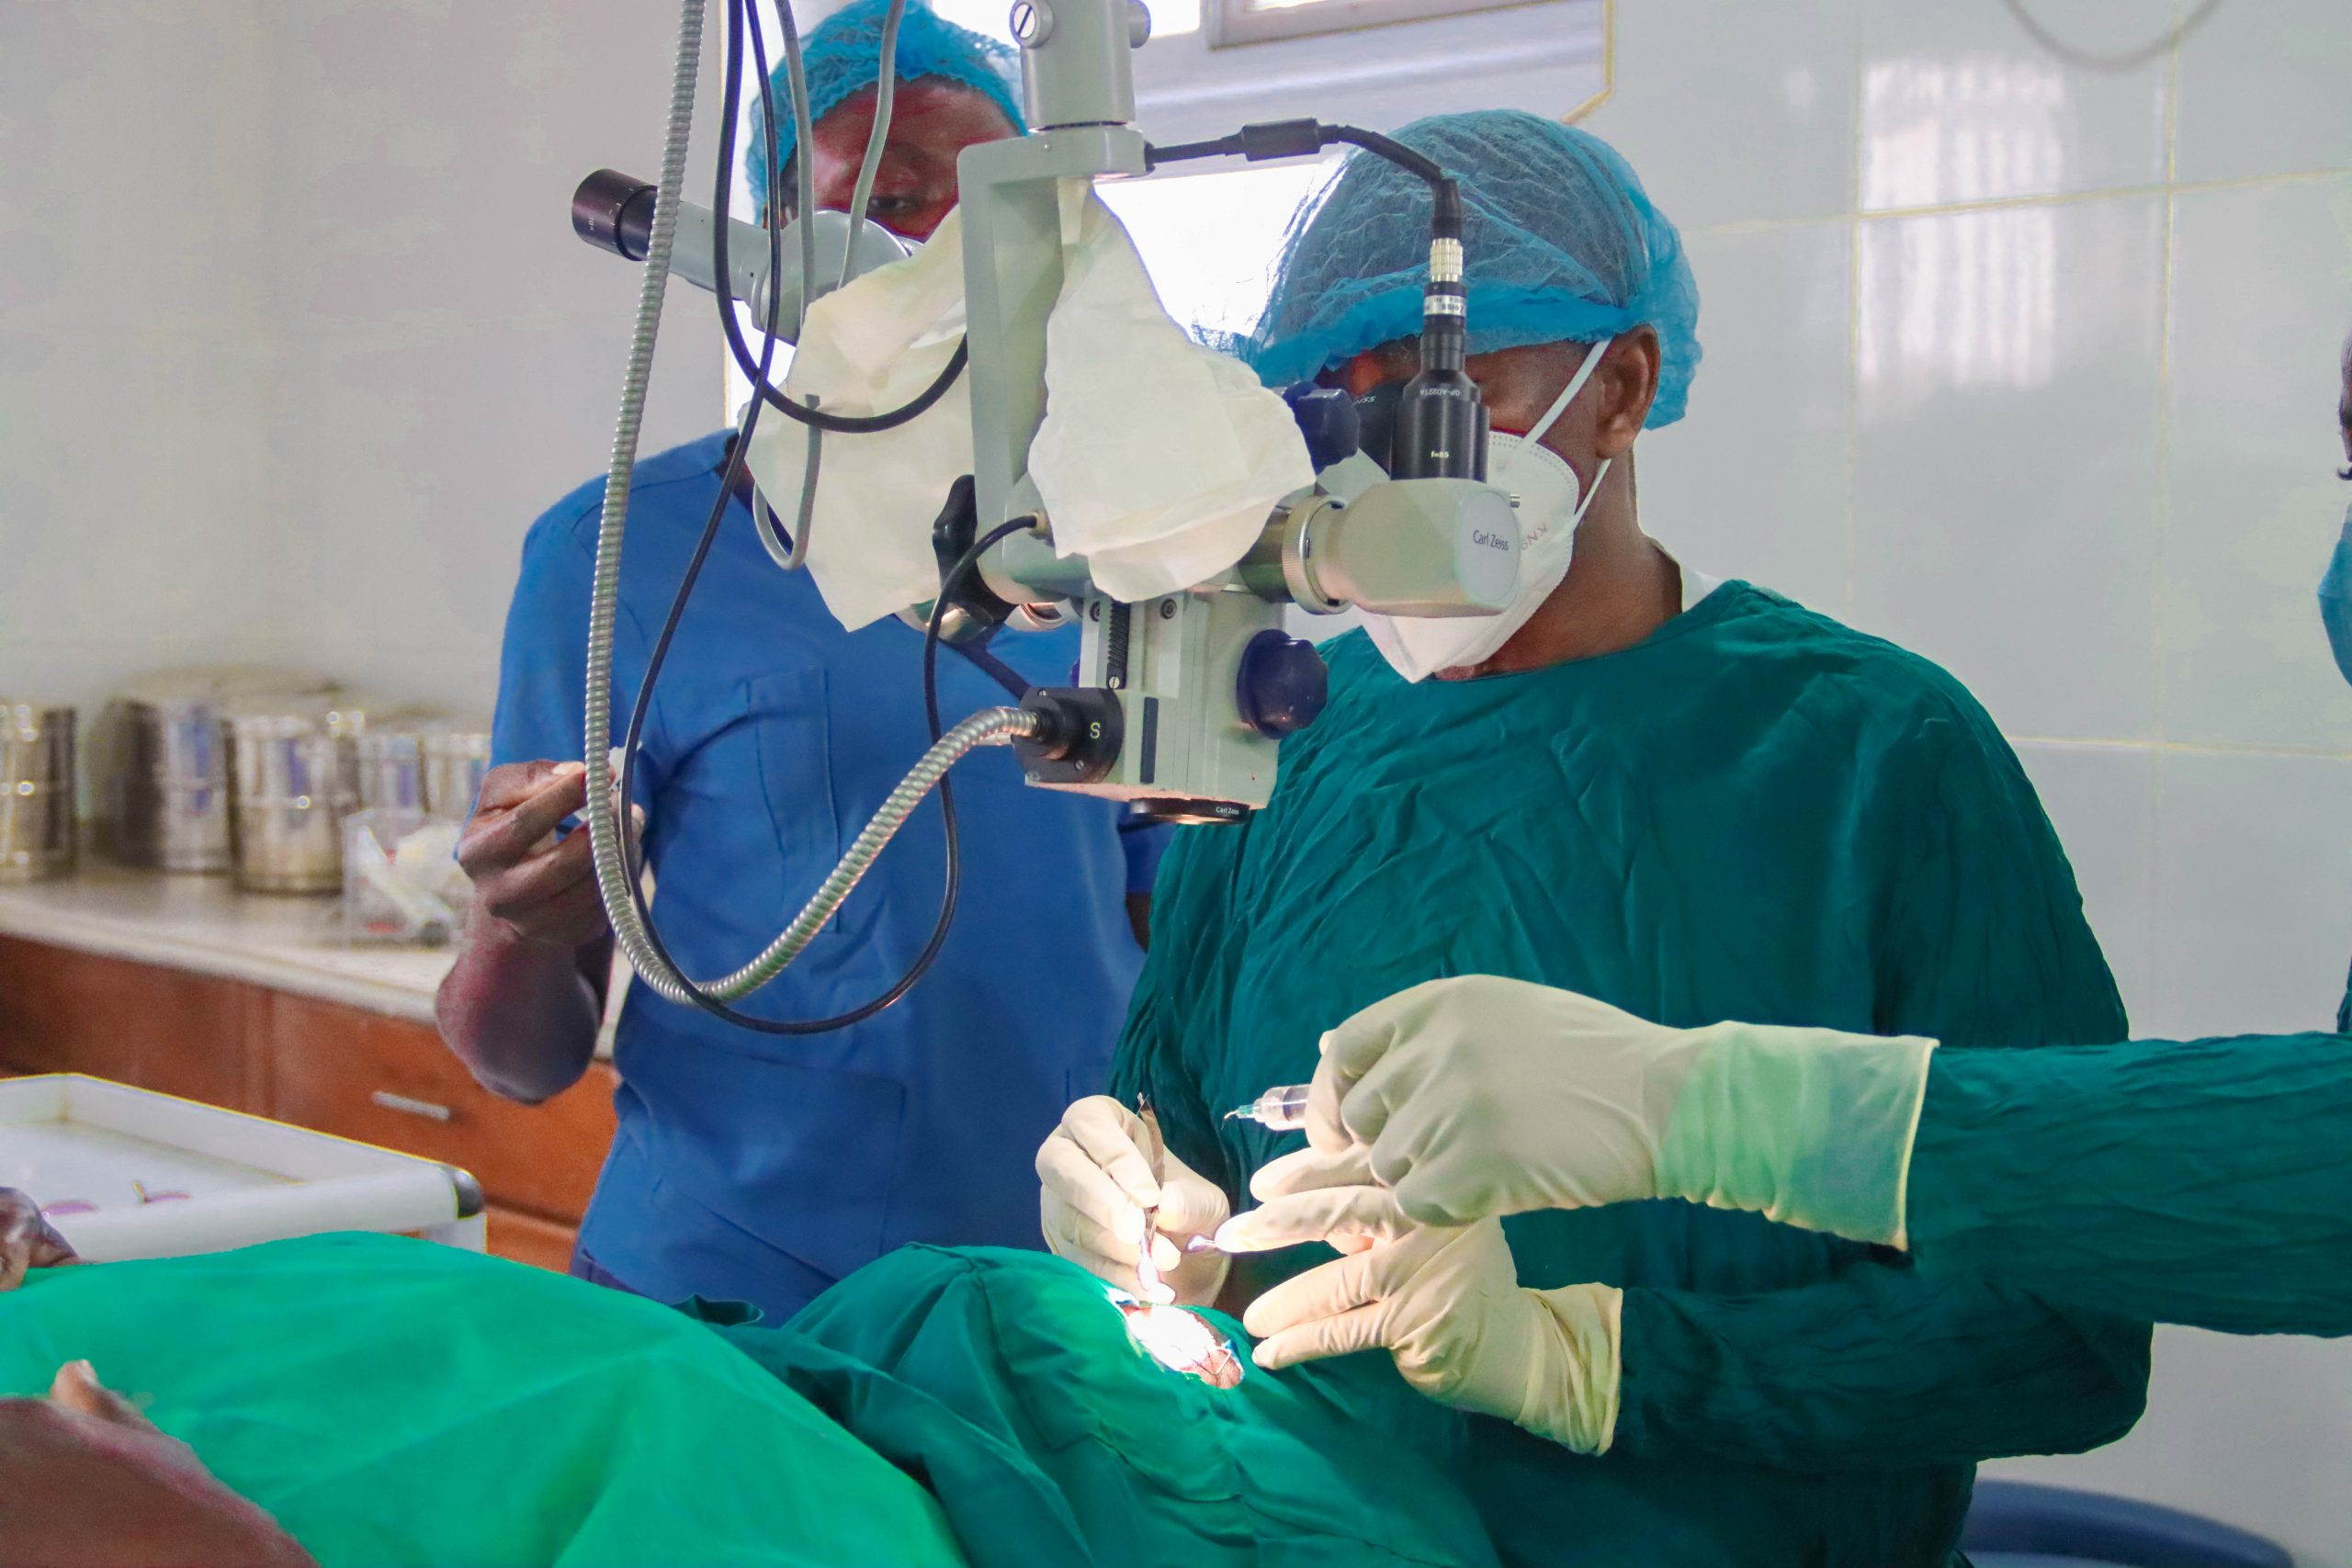 Dr. Thomas Baah preps for surgery